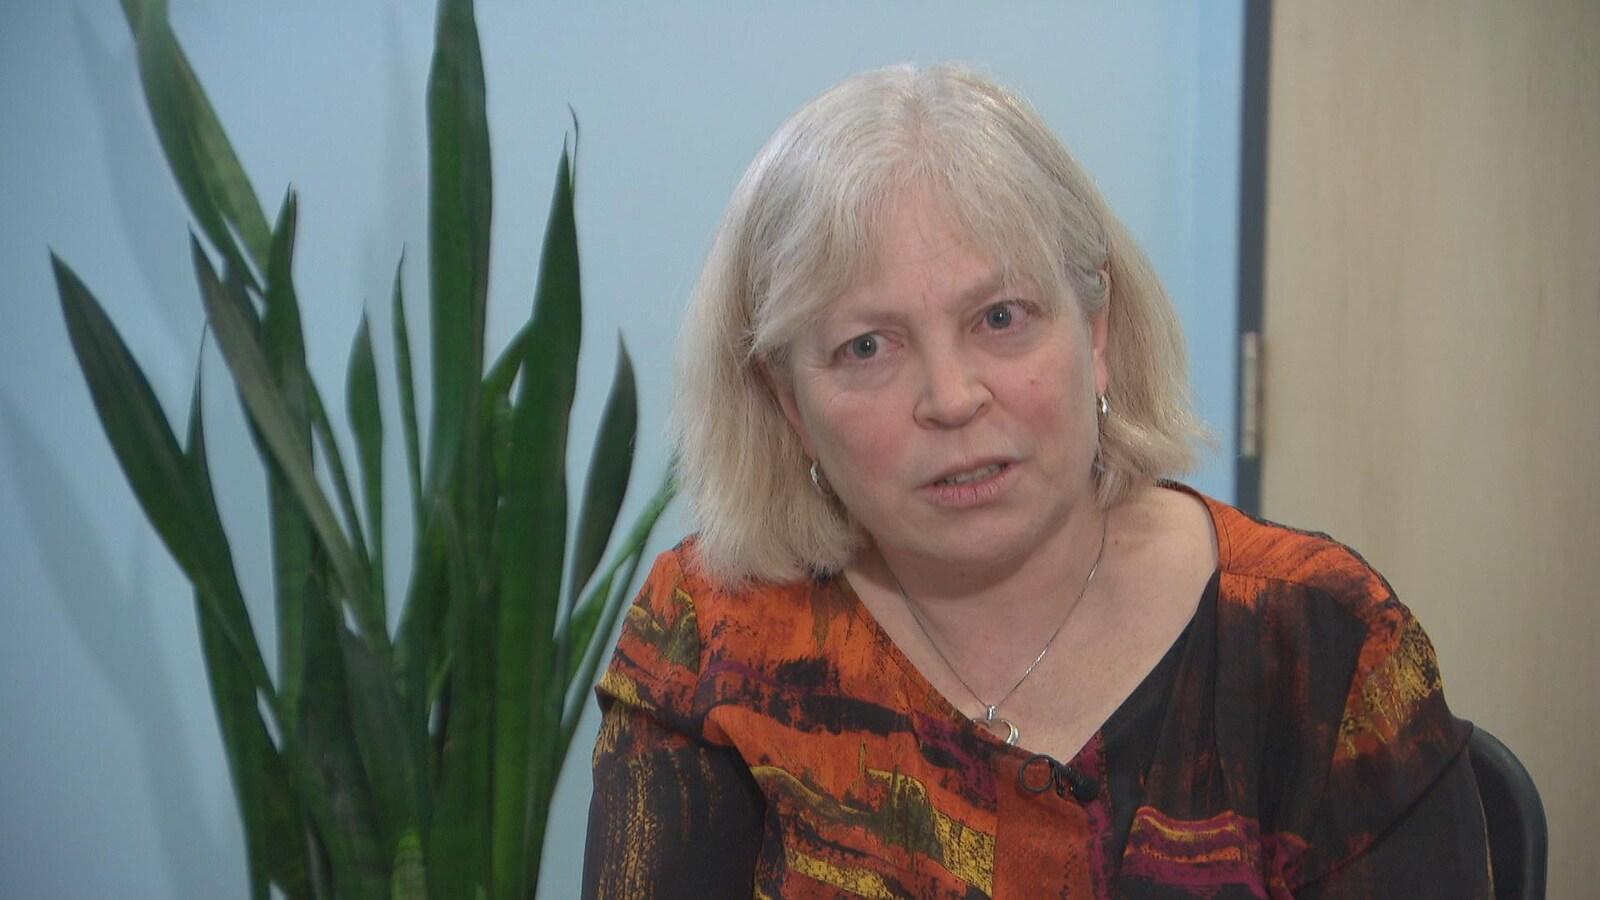 Louise McNaughton-Filion, coroner principale de l'Est de l'Ontario, en entrevue dans son bureau.